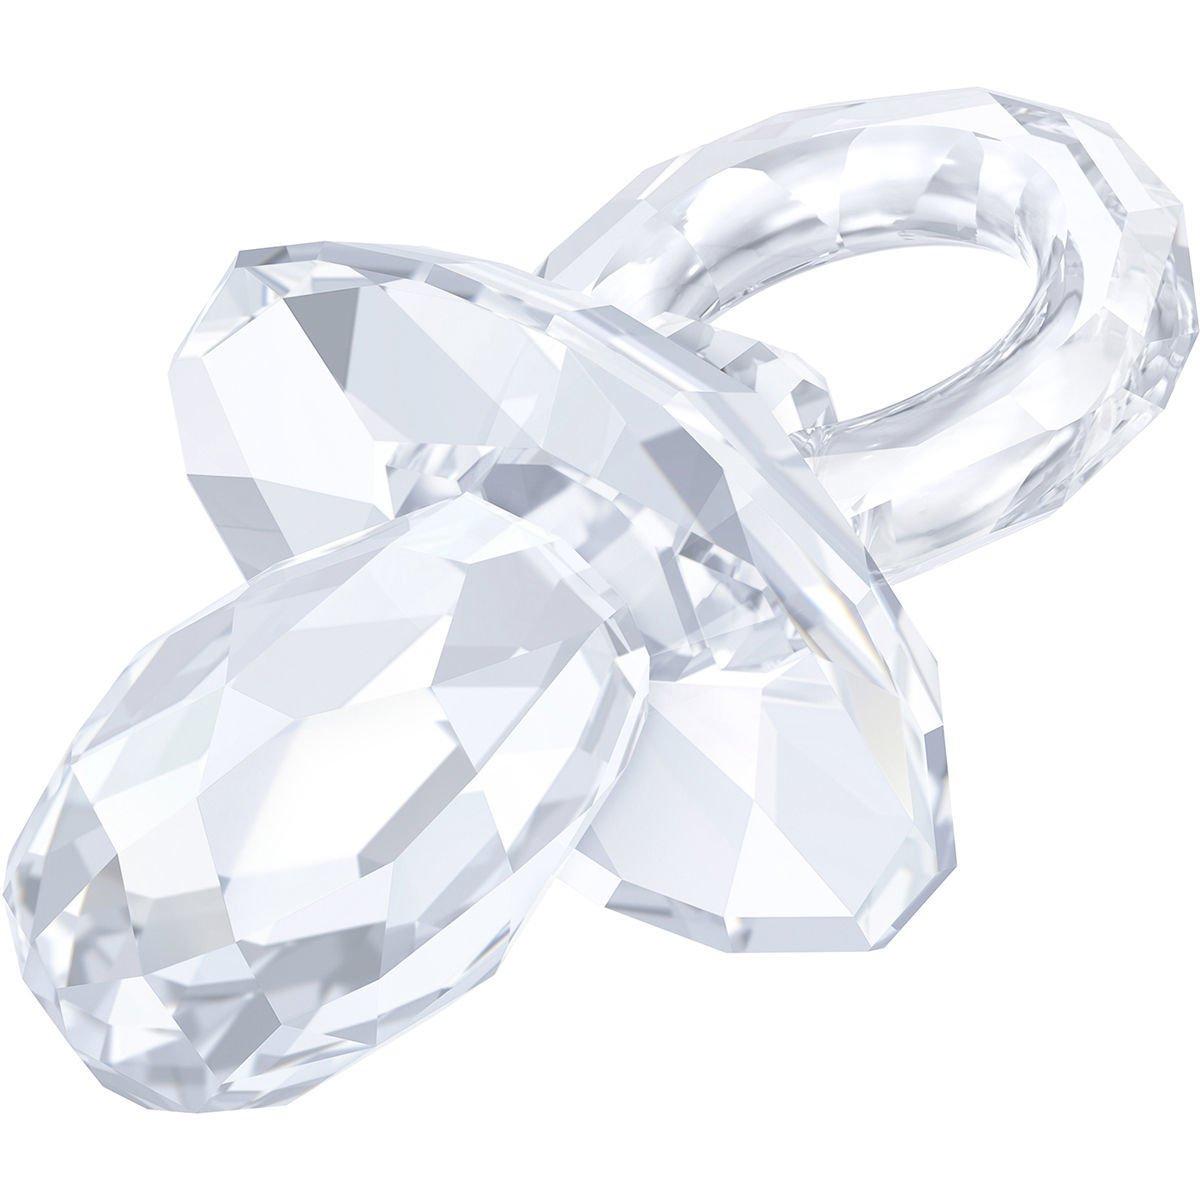 Amazon.com: Swarovski Schnuller, cristal, transparente ...